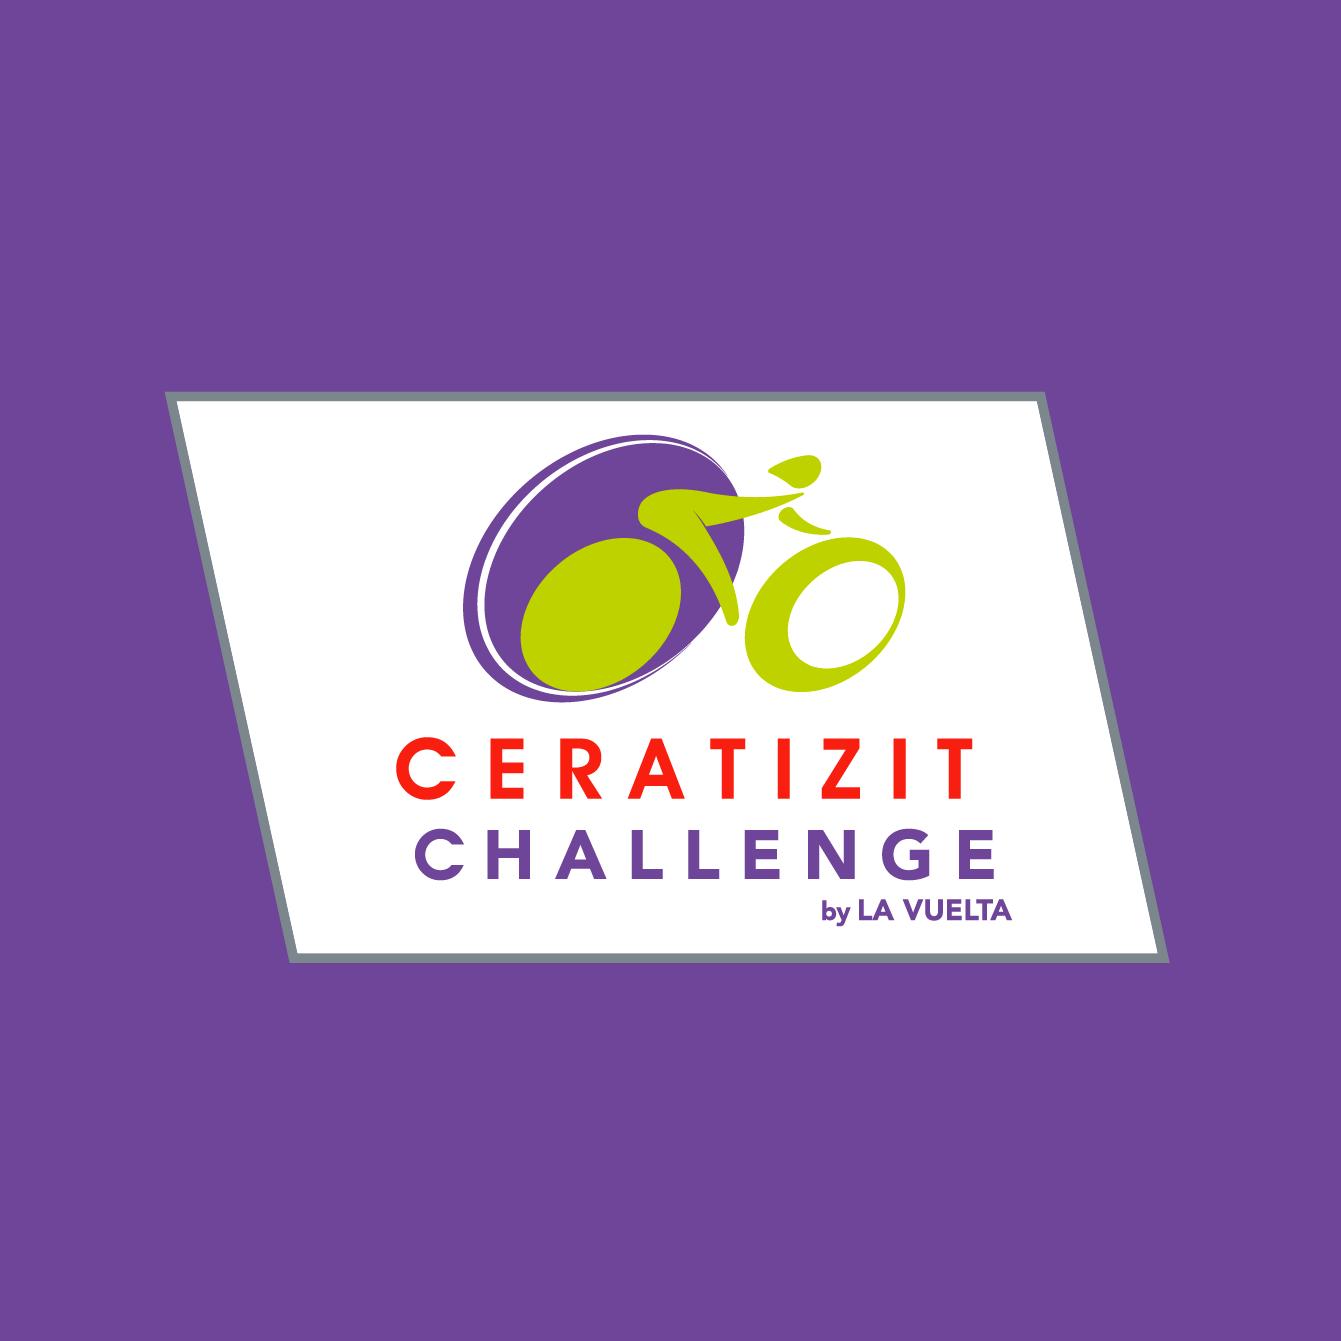 2021 UCI Cycling Women's World Tour - Ceratizit Challenge by la Vuelta